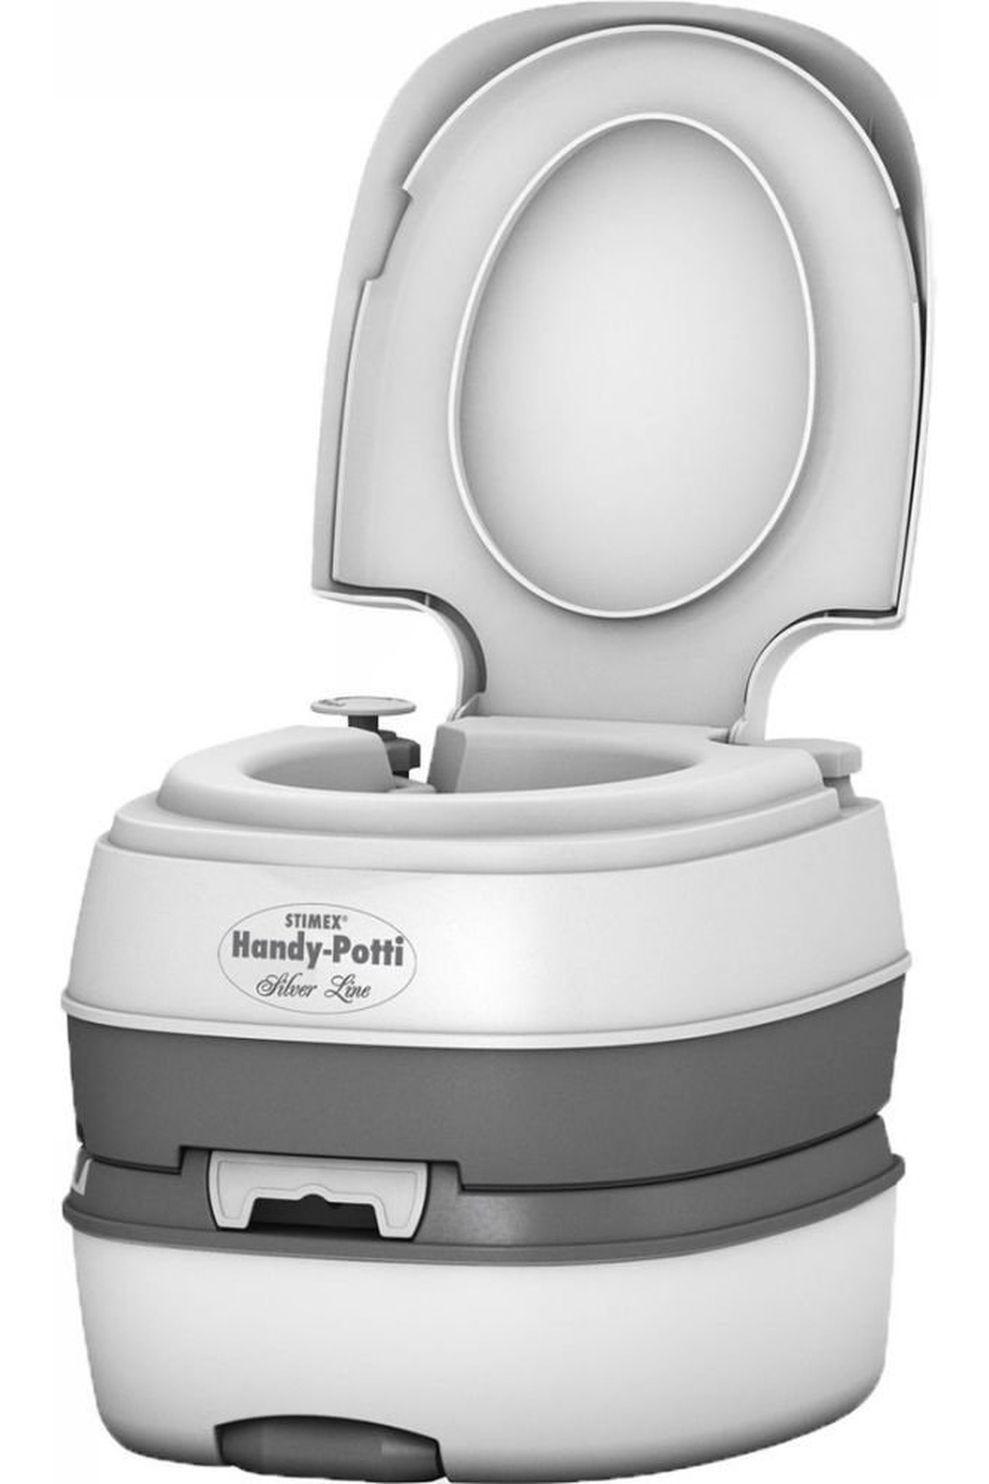 Stimex Toilet Handy Potti Silverline - - Transparant